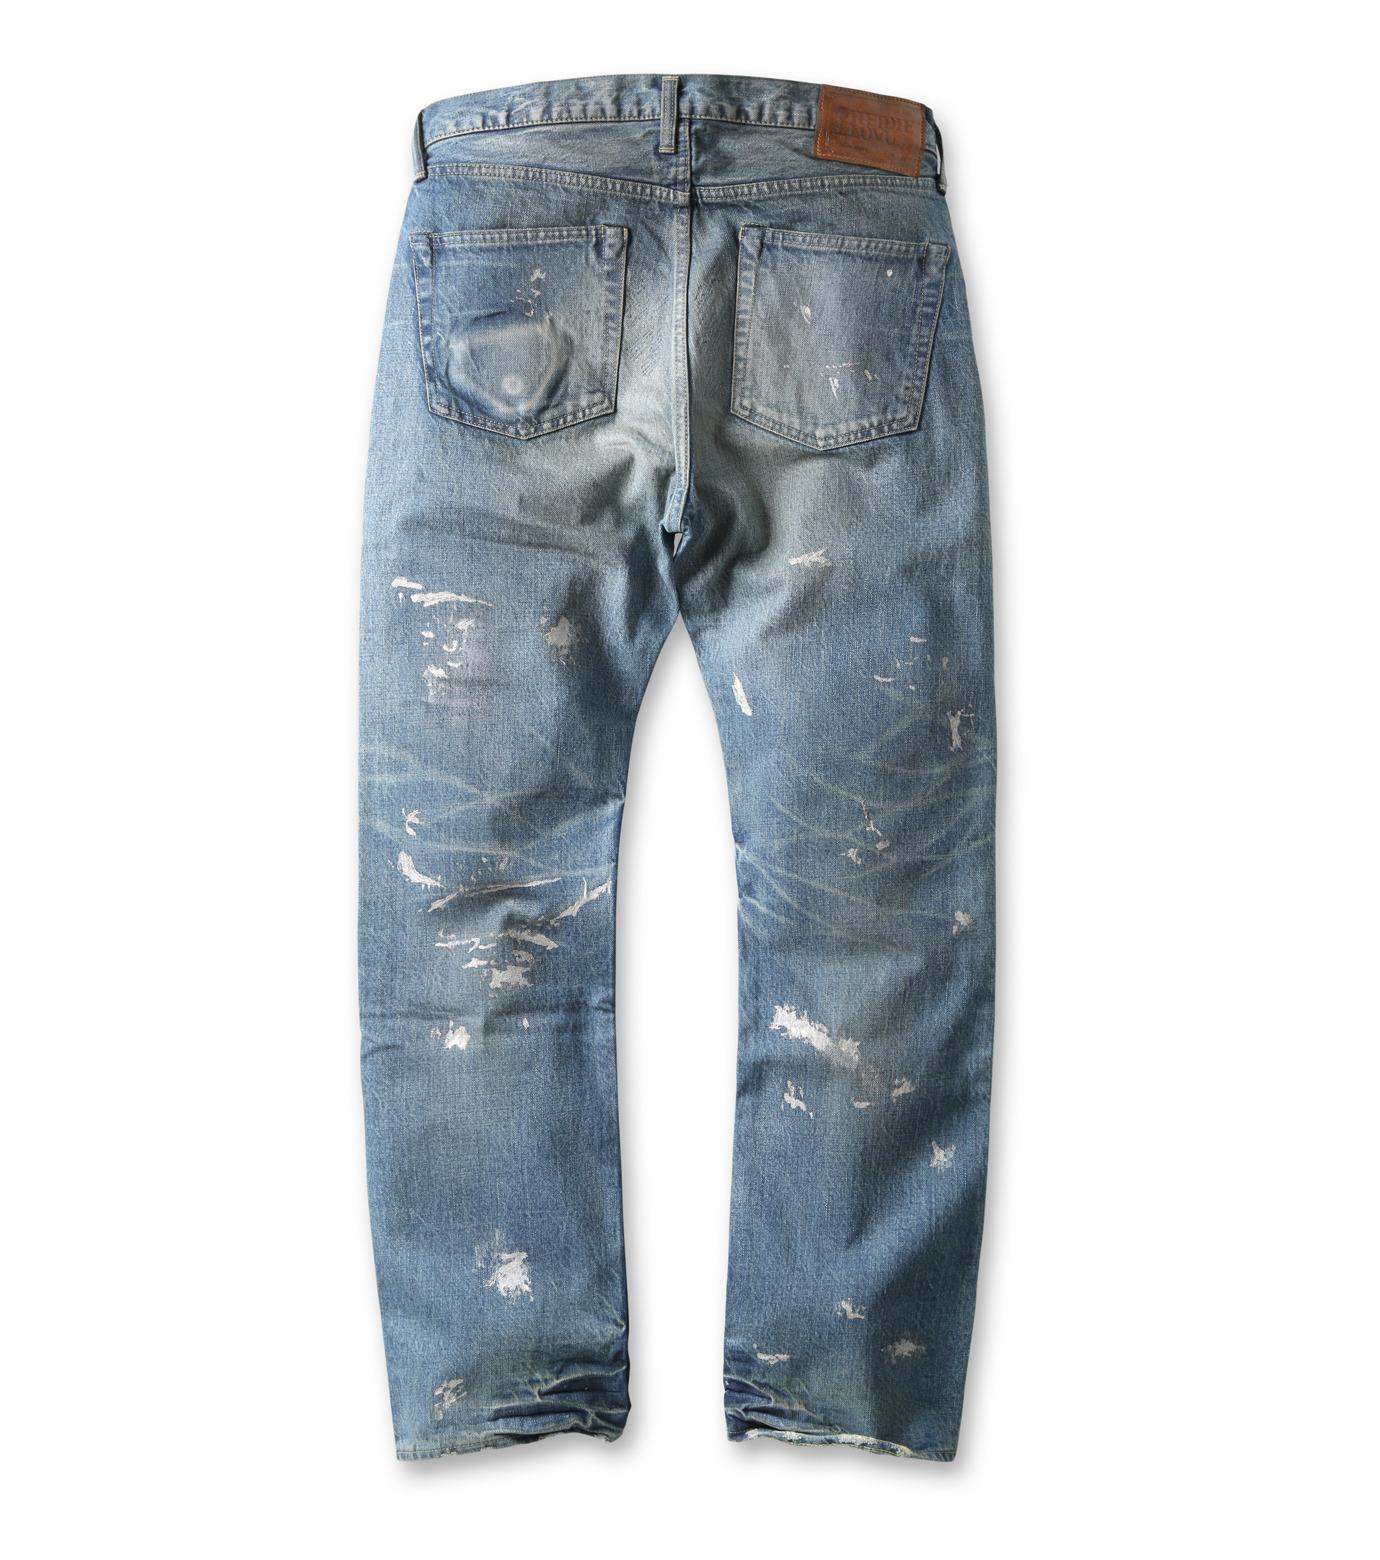 Heddie Lovu(エディー ルーヴ)のMAHOGANY LGT-SP1-LIGHT BLUE(パンツ/pants)-MAH-LGT-SP1-91 拡大詳細画像2